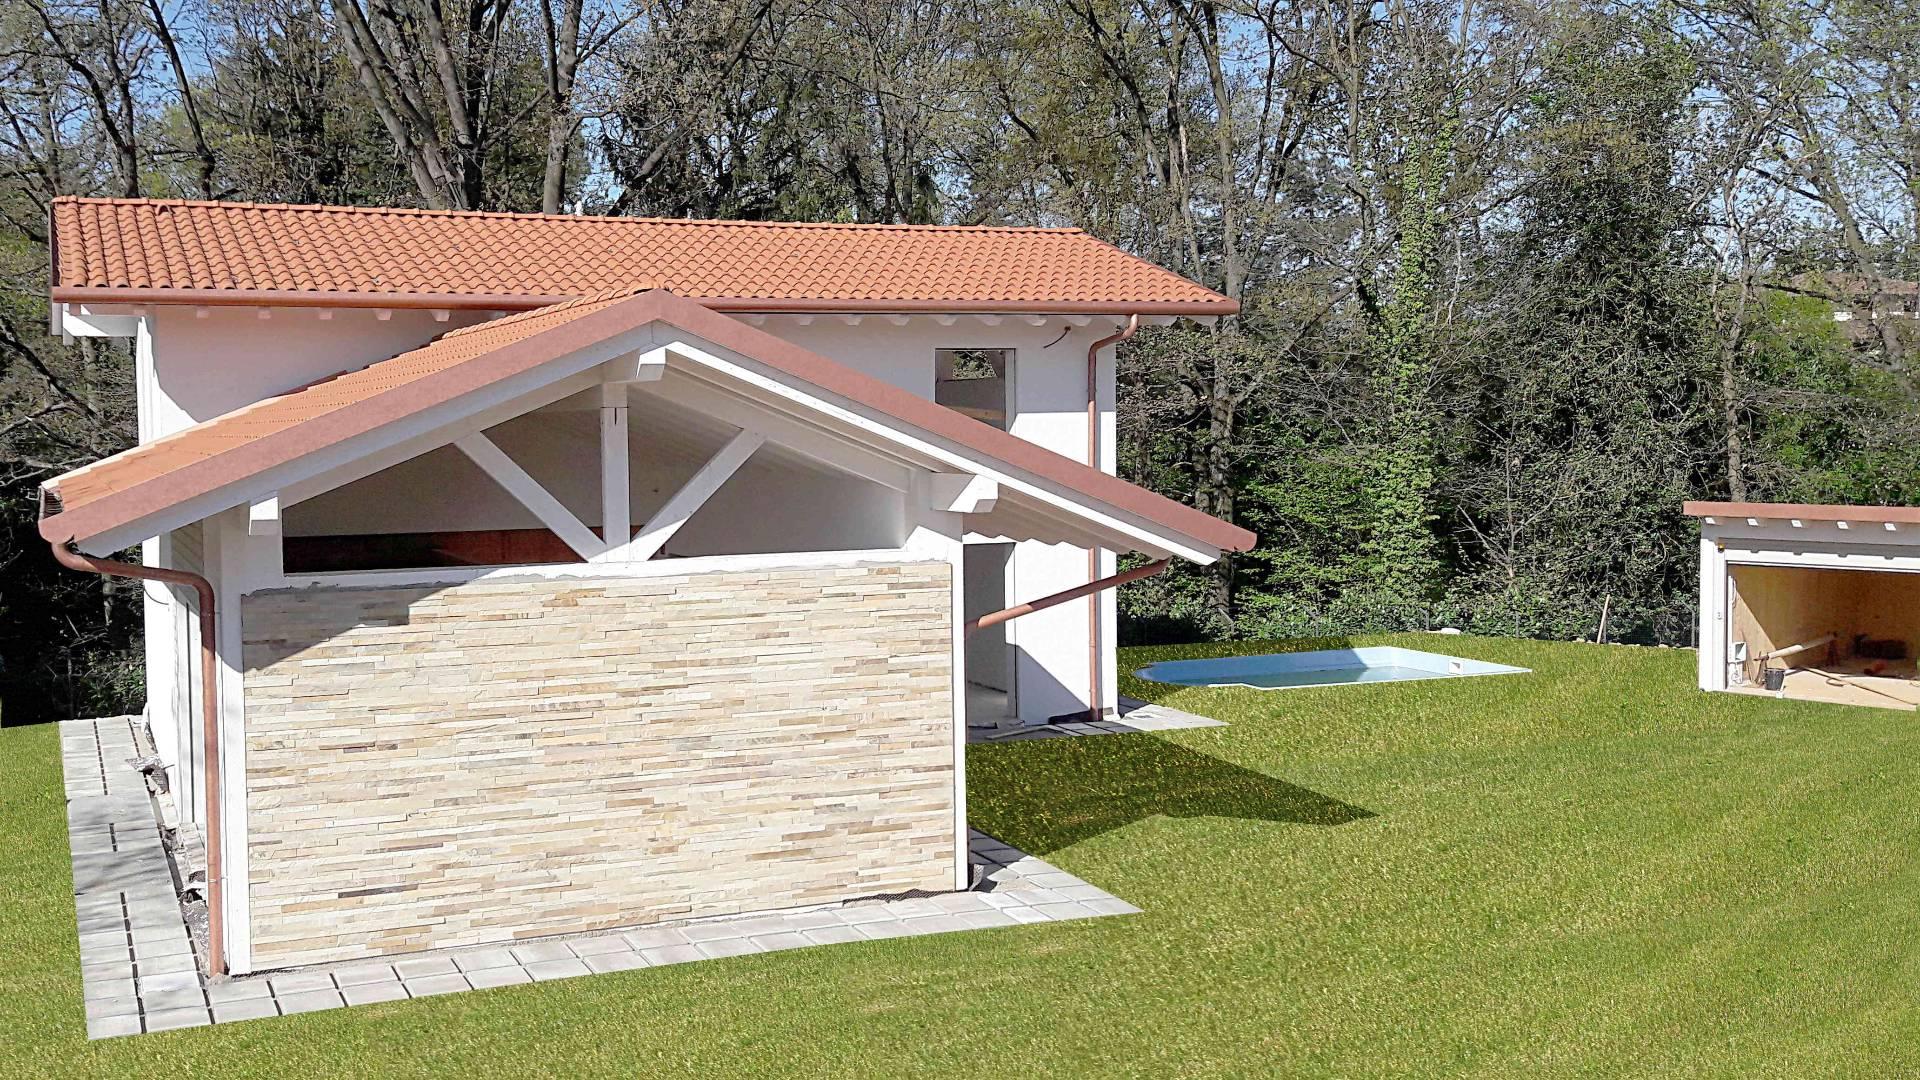 Villa in vendita a Tradate, 5 locali, Trattative riservate | CambioCasa.it